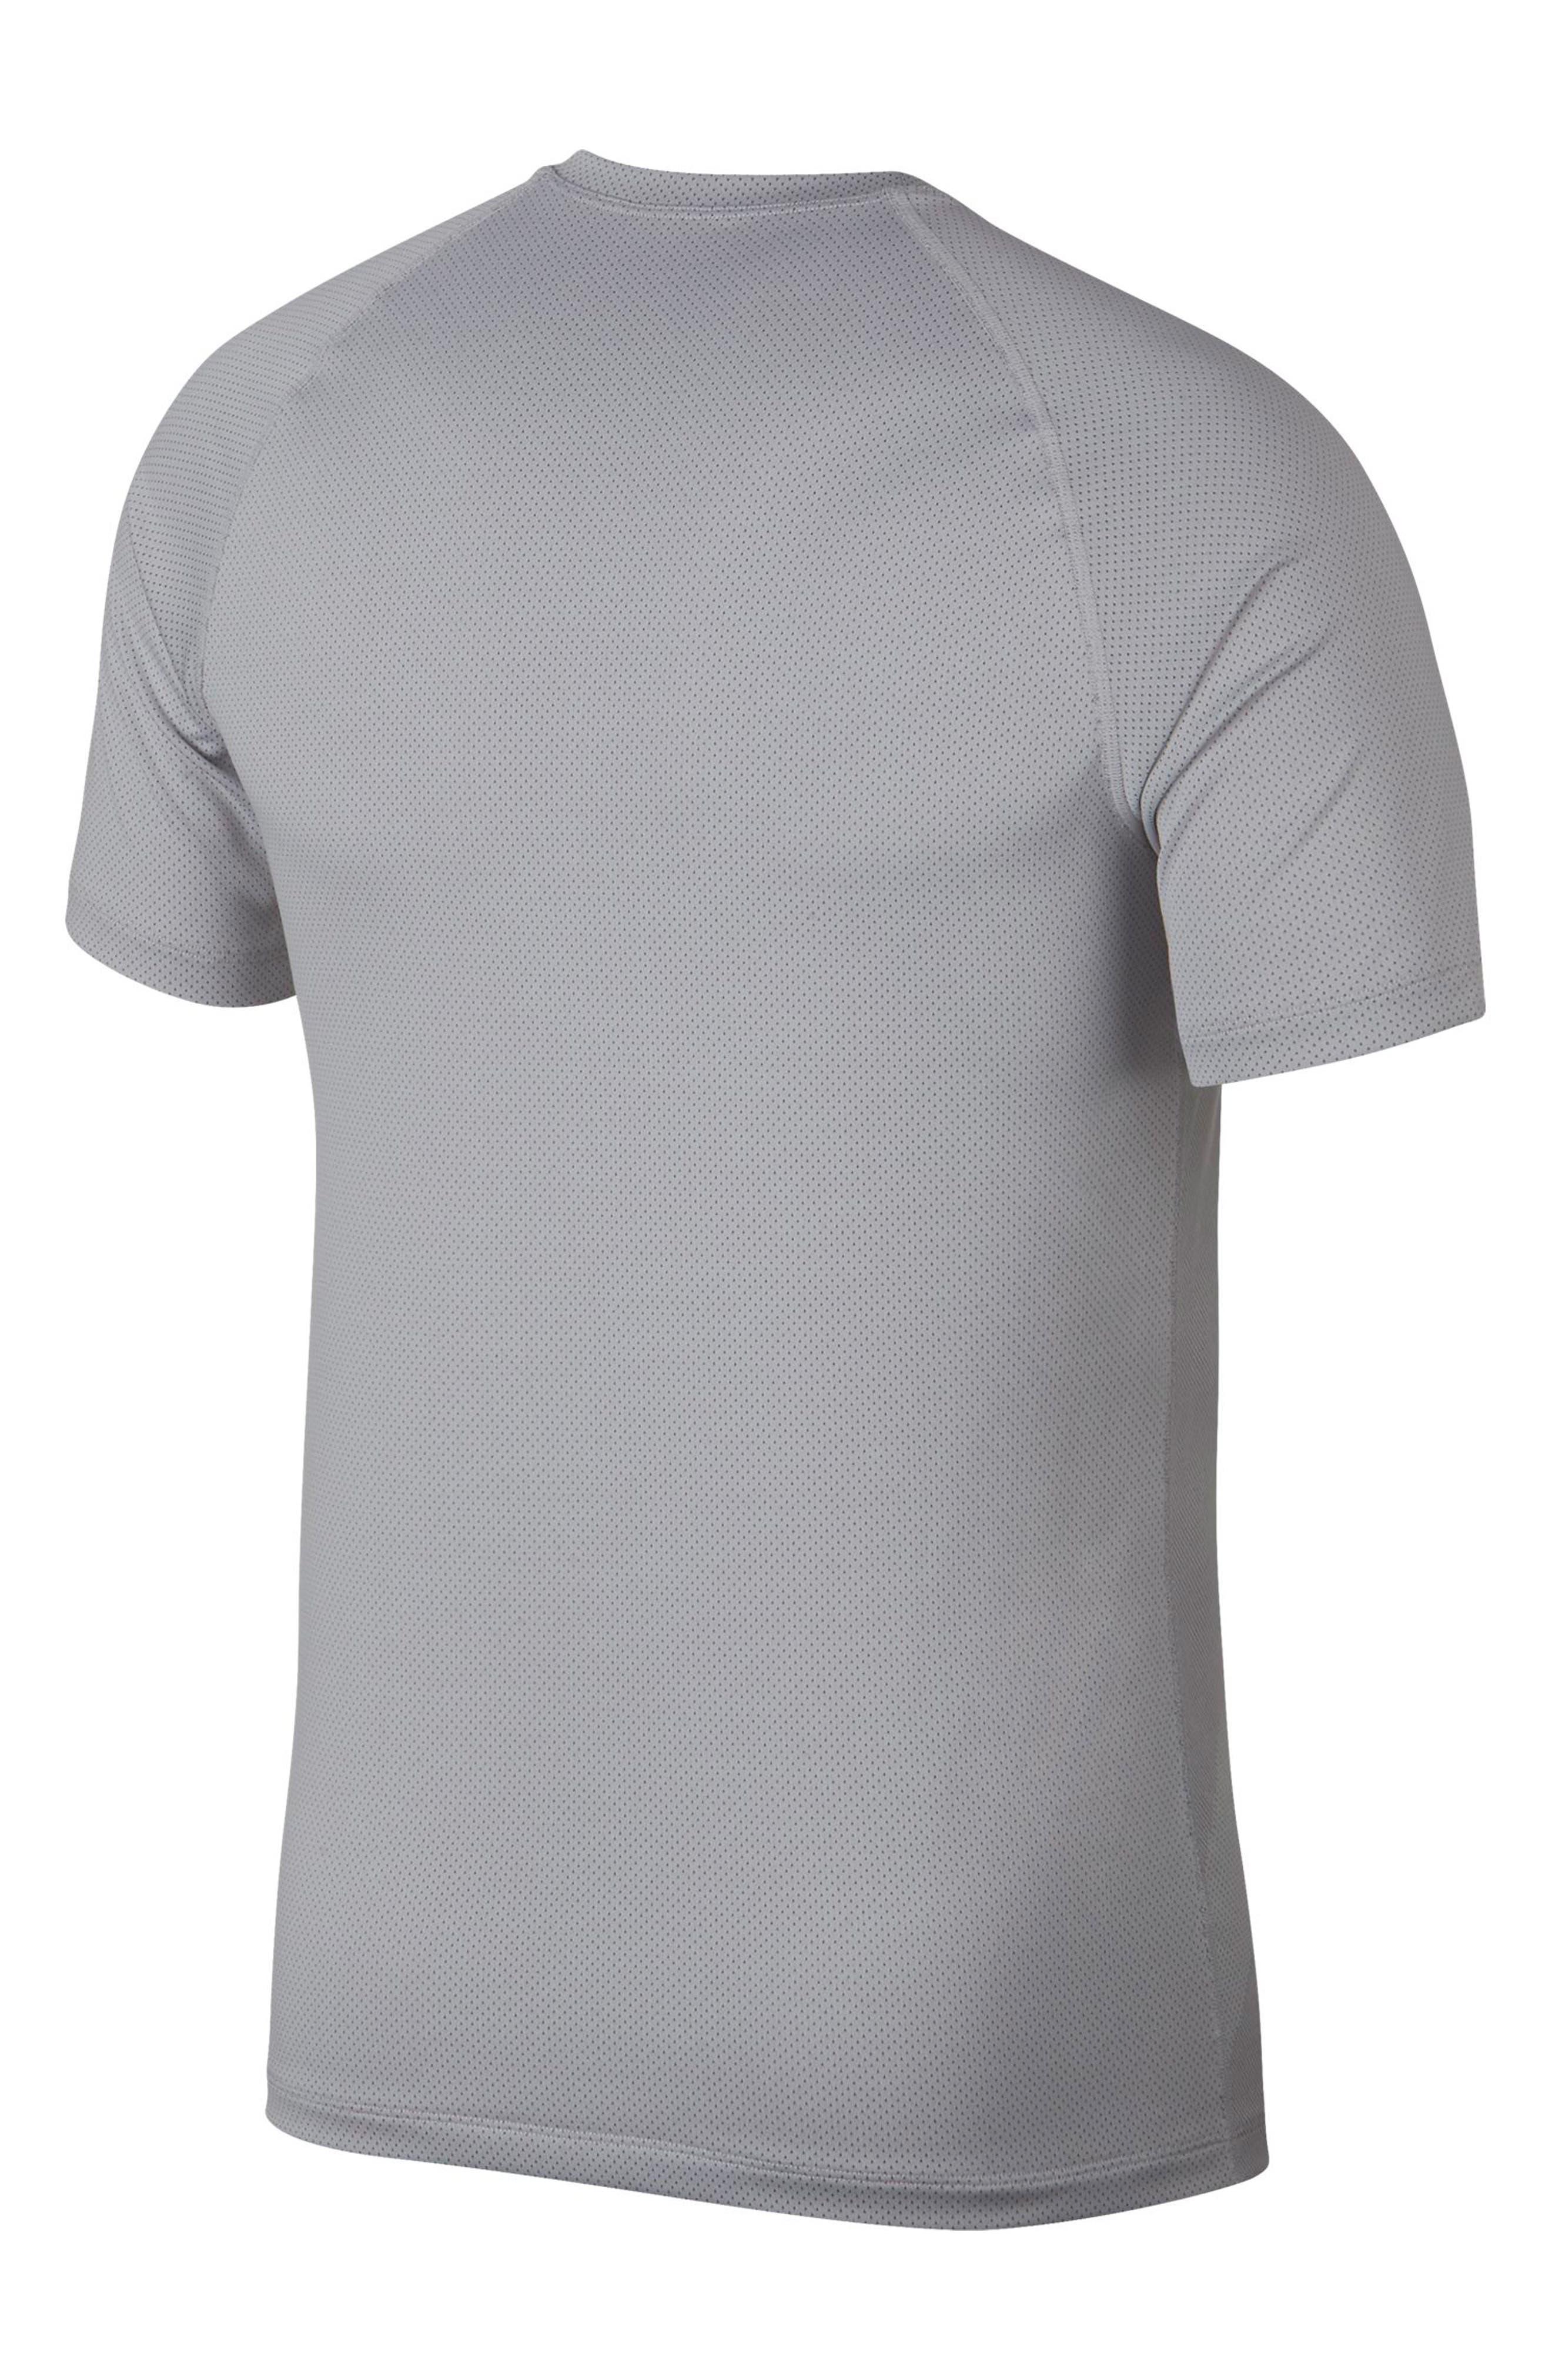 ,                             Pro Dri-FIT Perforated T-Shirt,                             Alternate thumbnail 7, color,                             VAST GREY/ GUNSMOKE/ VAST GREY